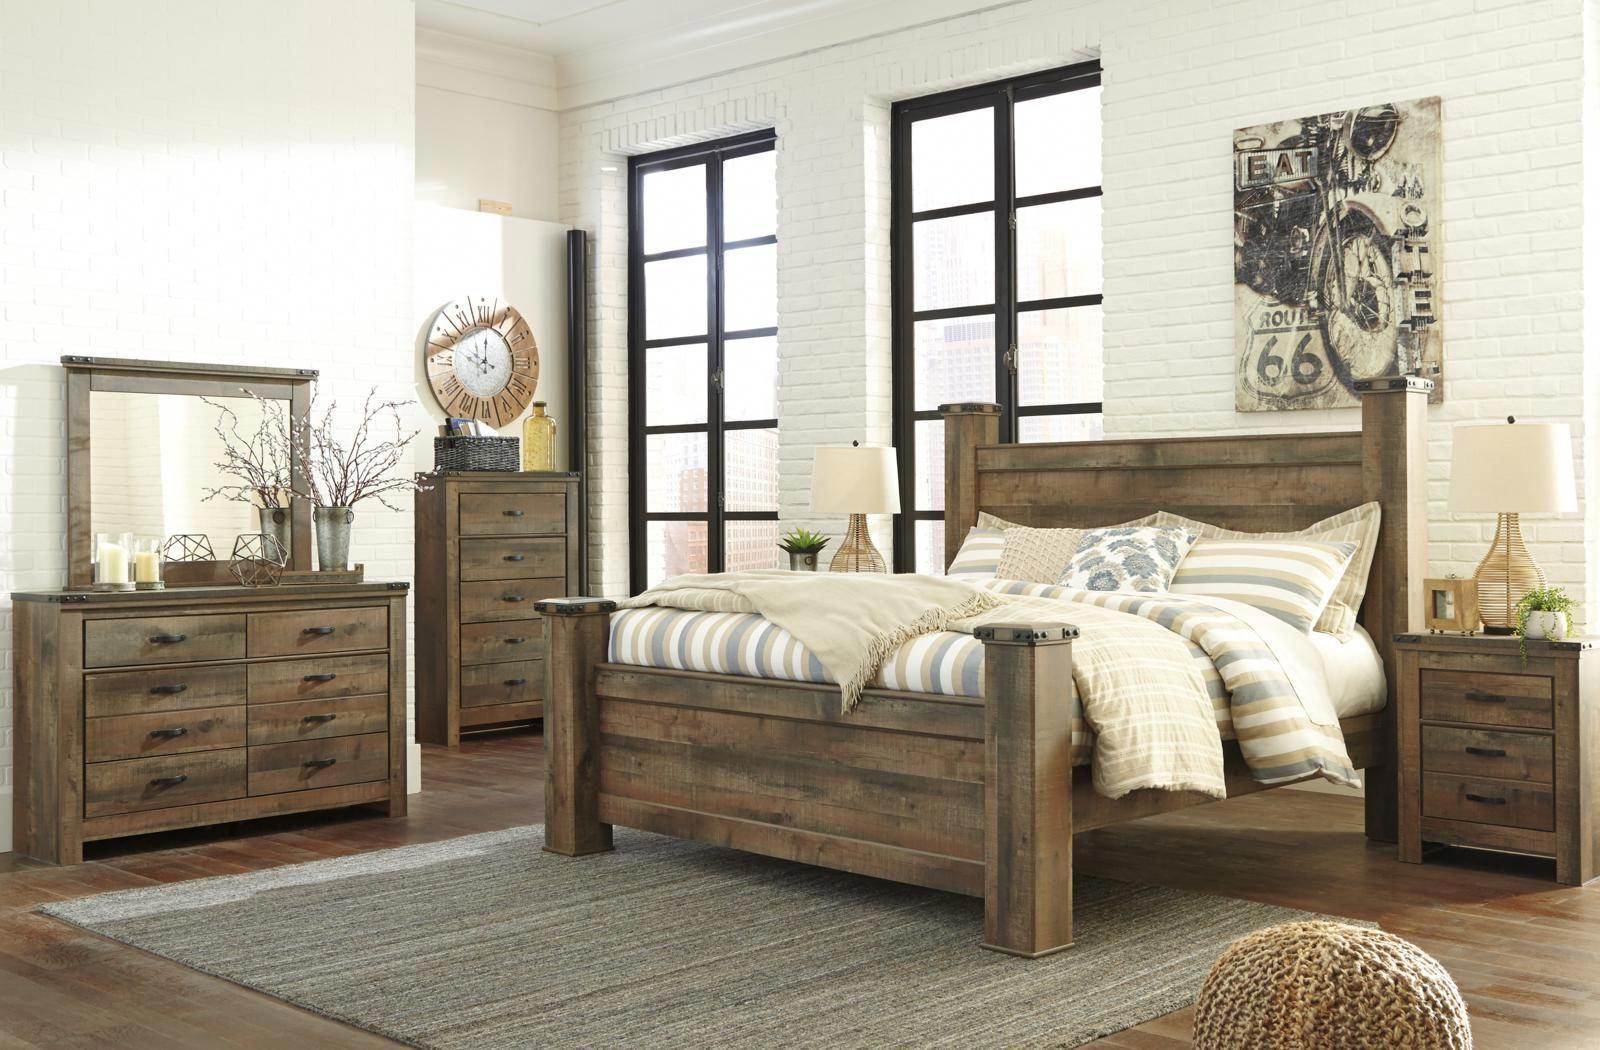 Trinell 4 Piece Poster Bedroom Set In Warm Rustic Oak In 2020 King Bedroom Sets Rustic Bedroom Furniture Bedroom Set